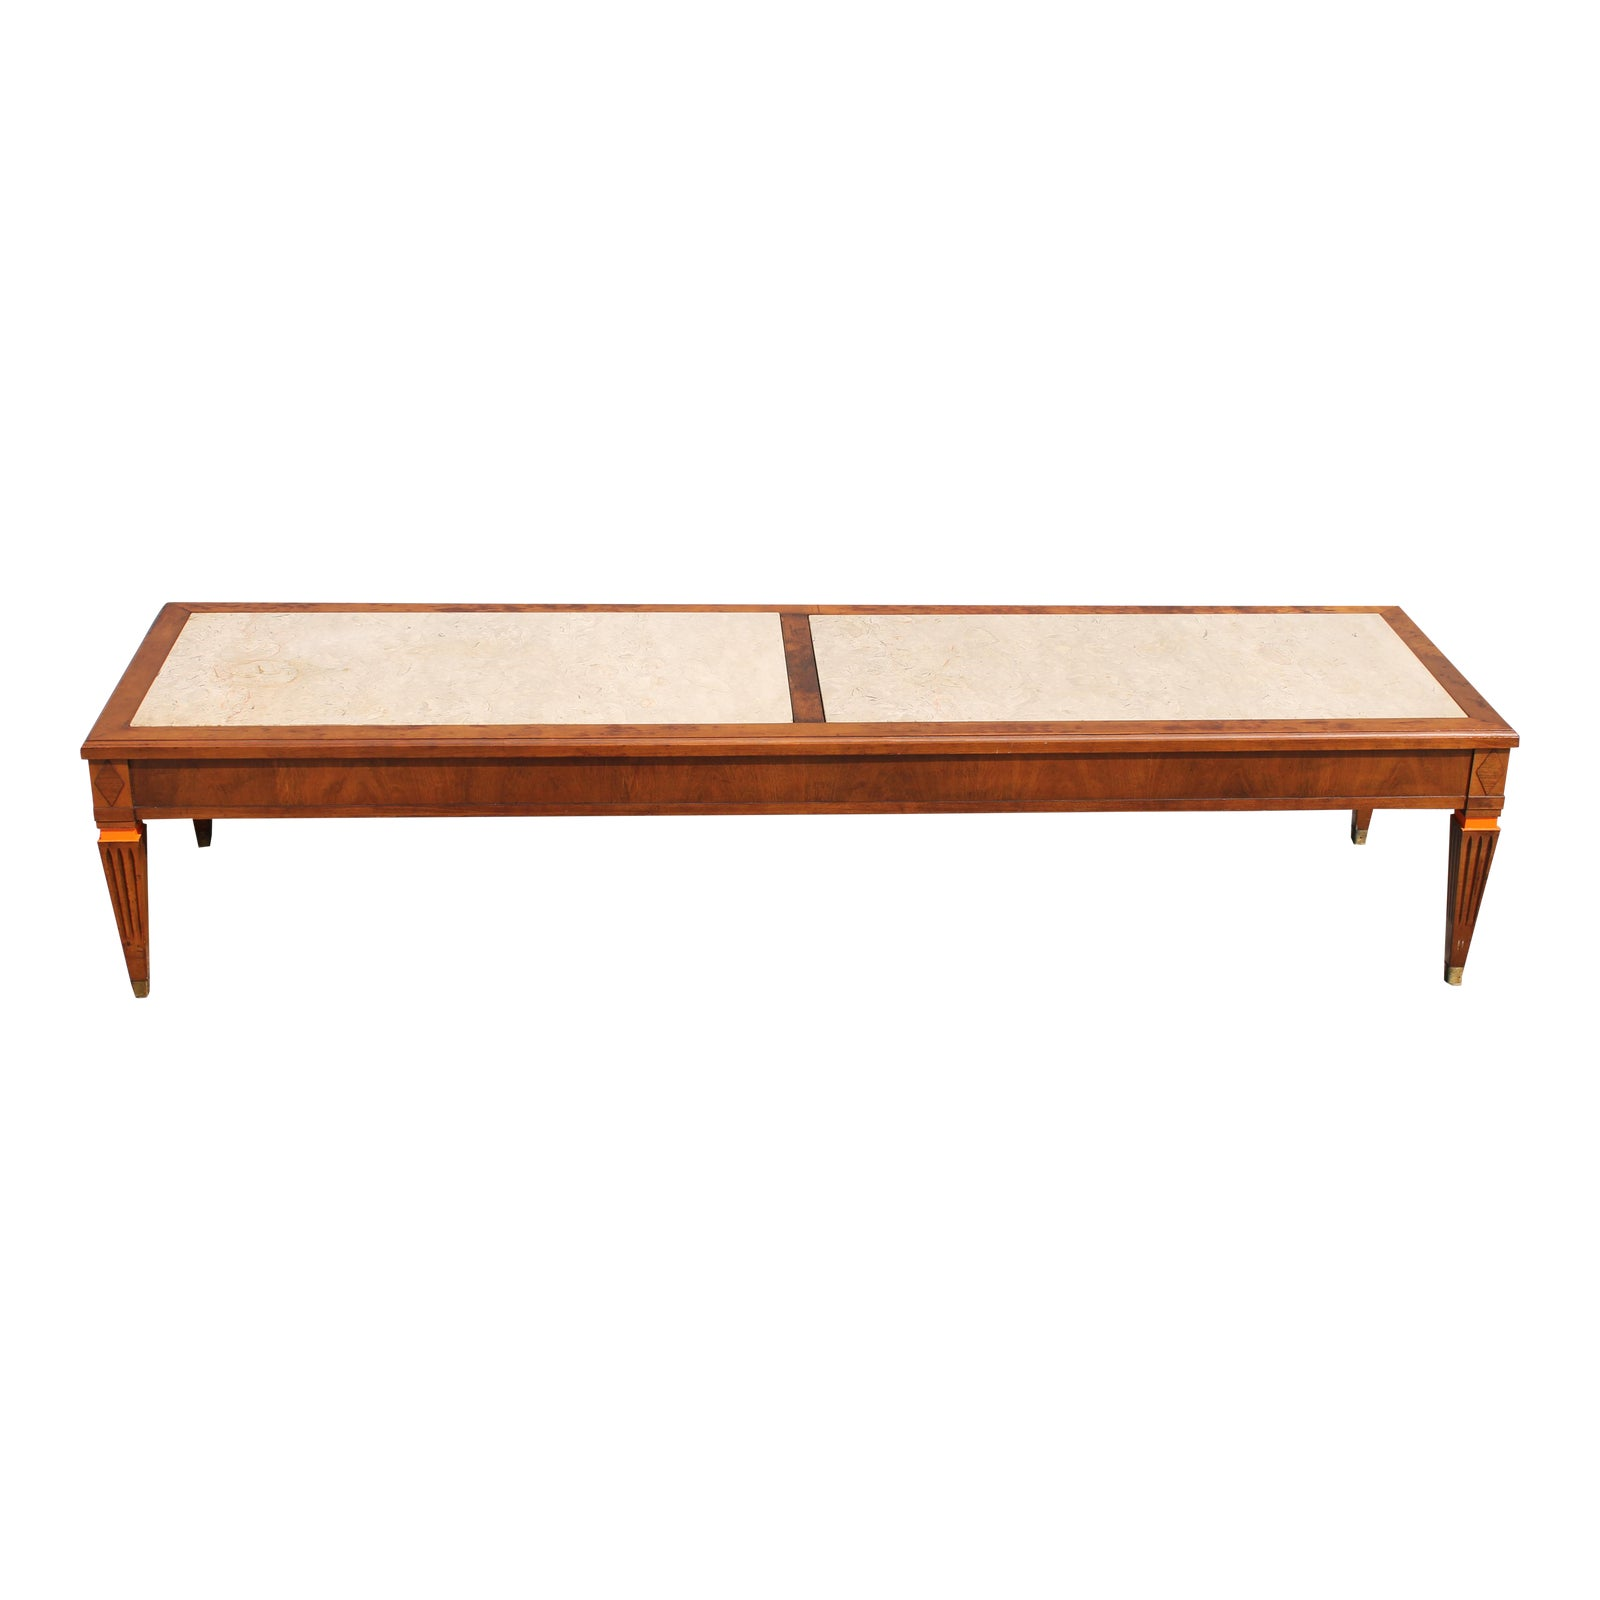 Strange Mid Century Modern Stone Top Coffee Table Ncnpc Chair Design For Home Ncnpcorg